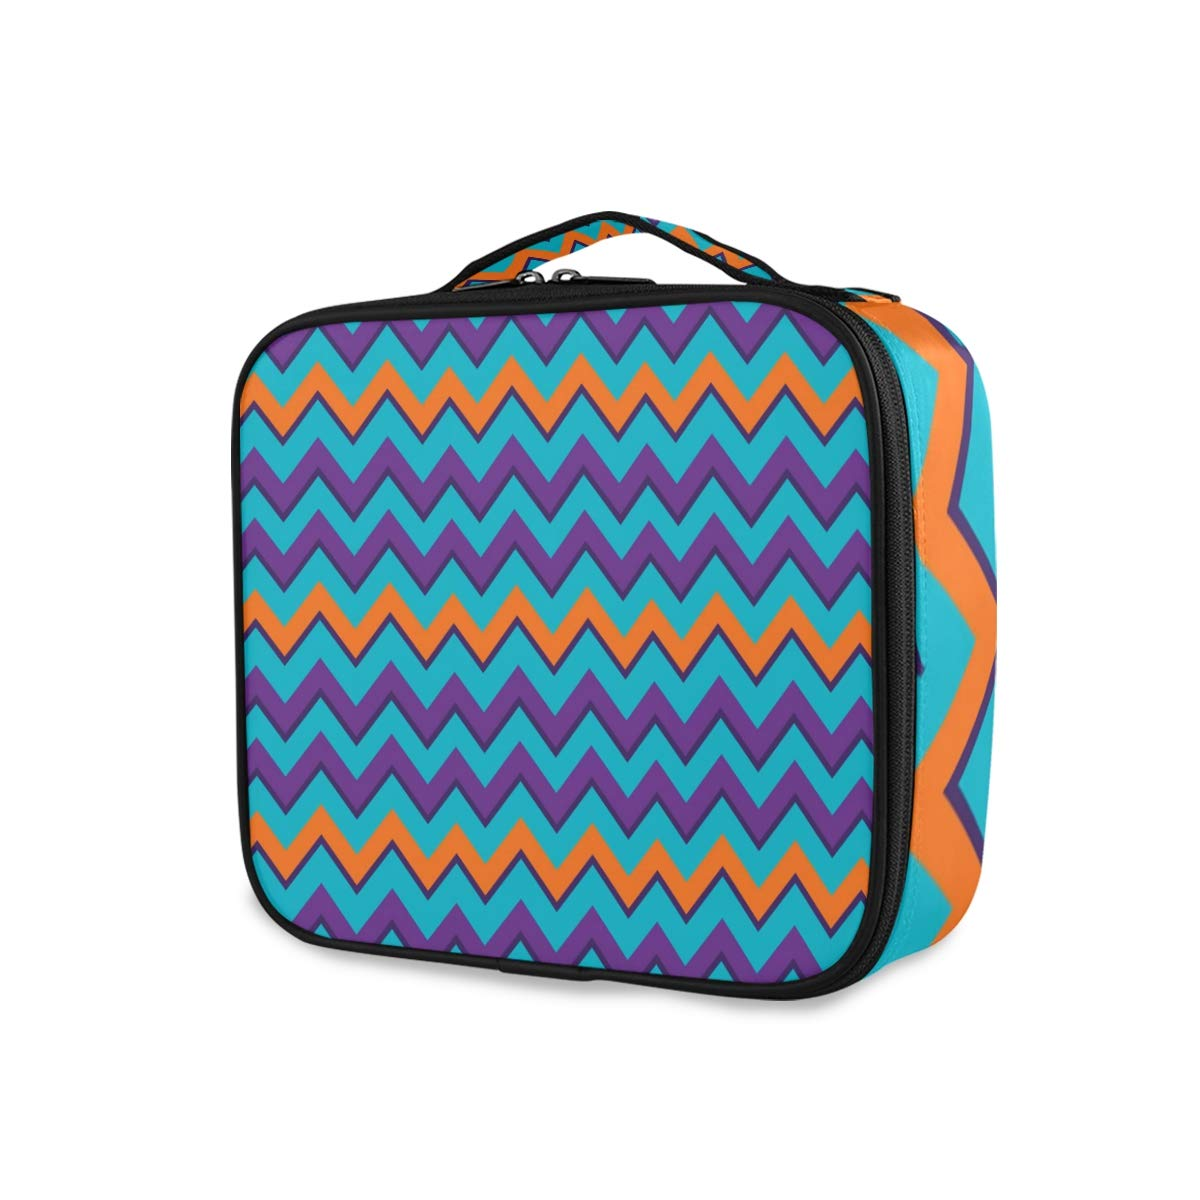 TravelStripe Translated Max 61% OFF Ripple Case Portable Organizer Bag Train Cas Makeup